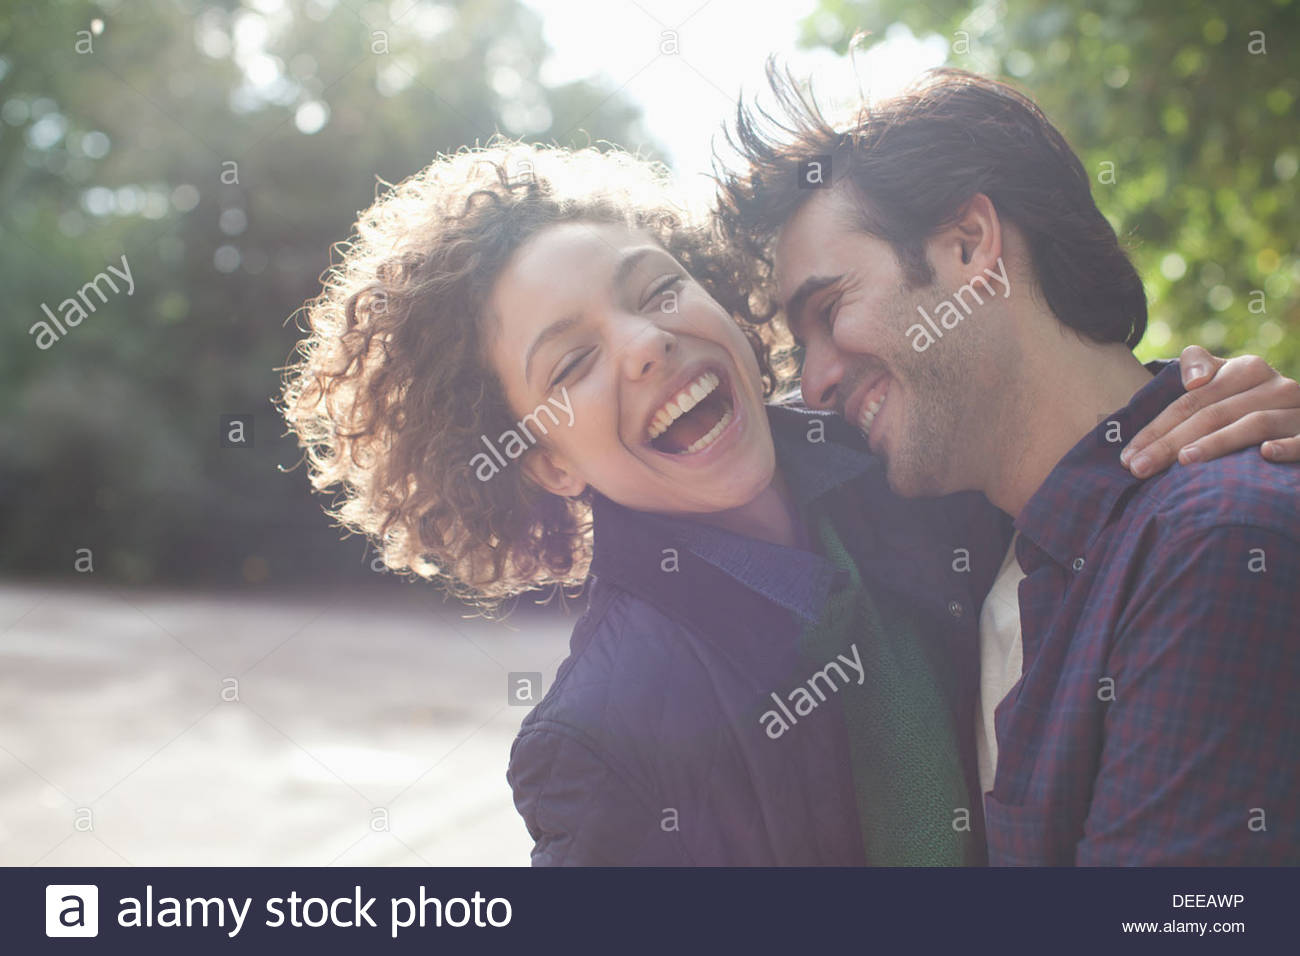 Lachen, paar umarmt hautnah Stockbild